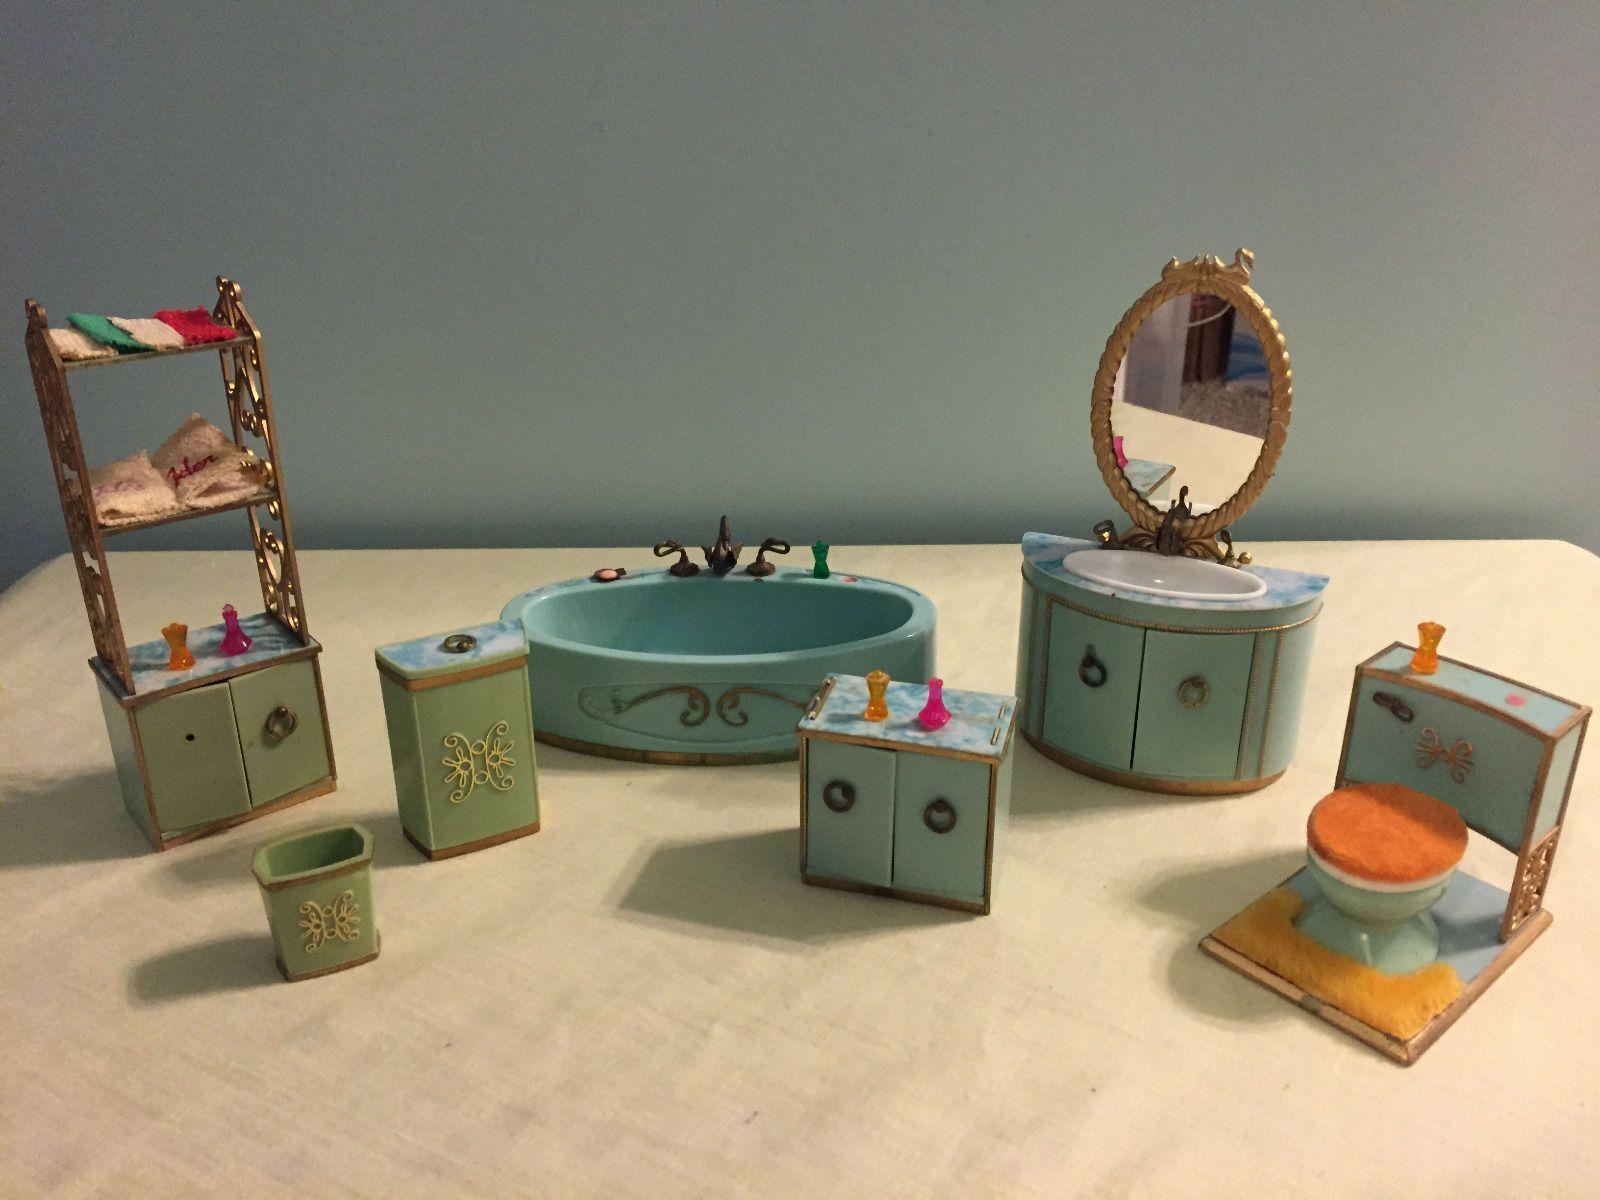 Vintage Ideal Petite Princess Bathroom Doll House Furniture Set InTurquoise  1:16